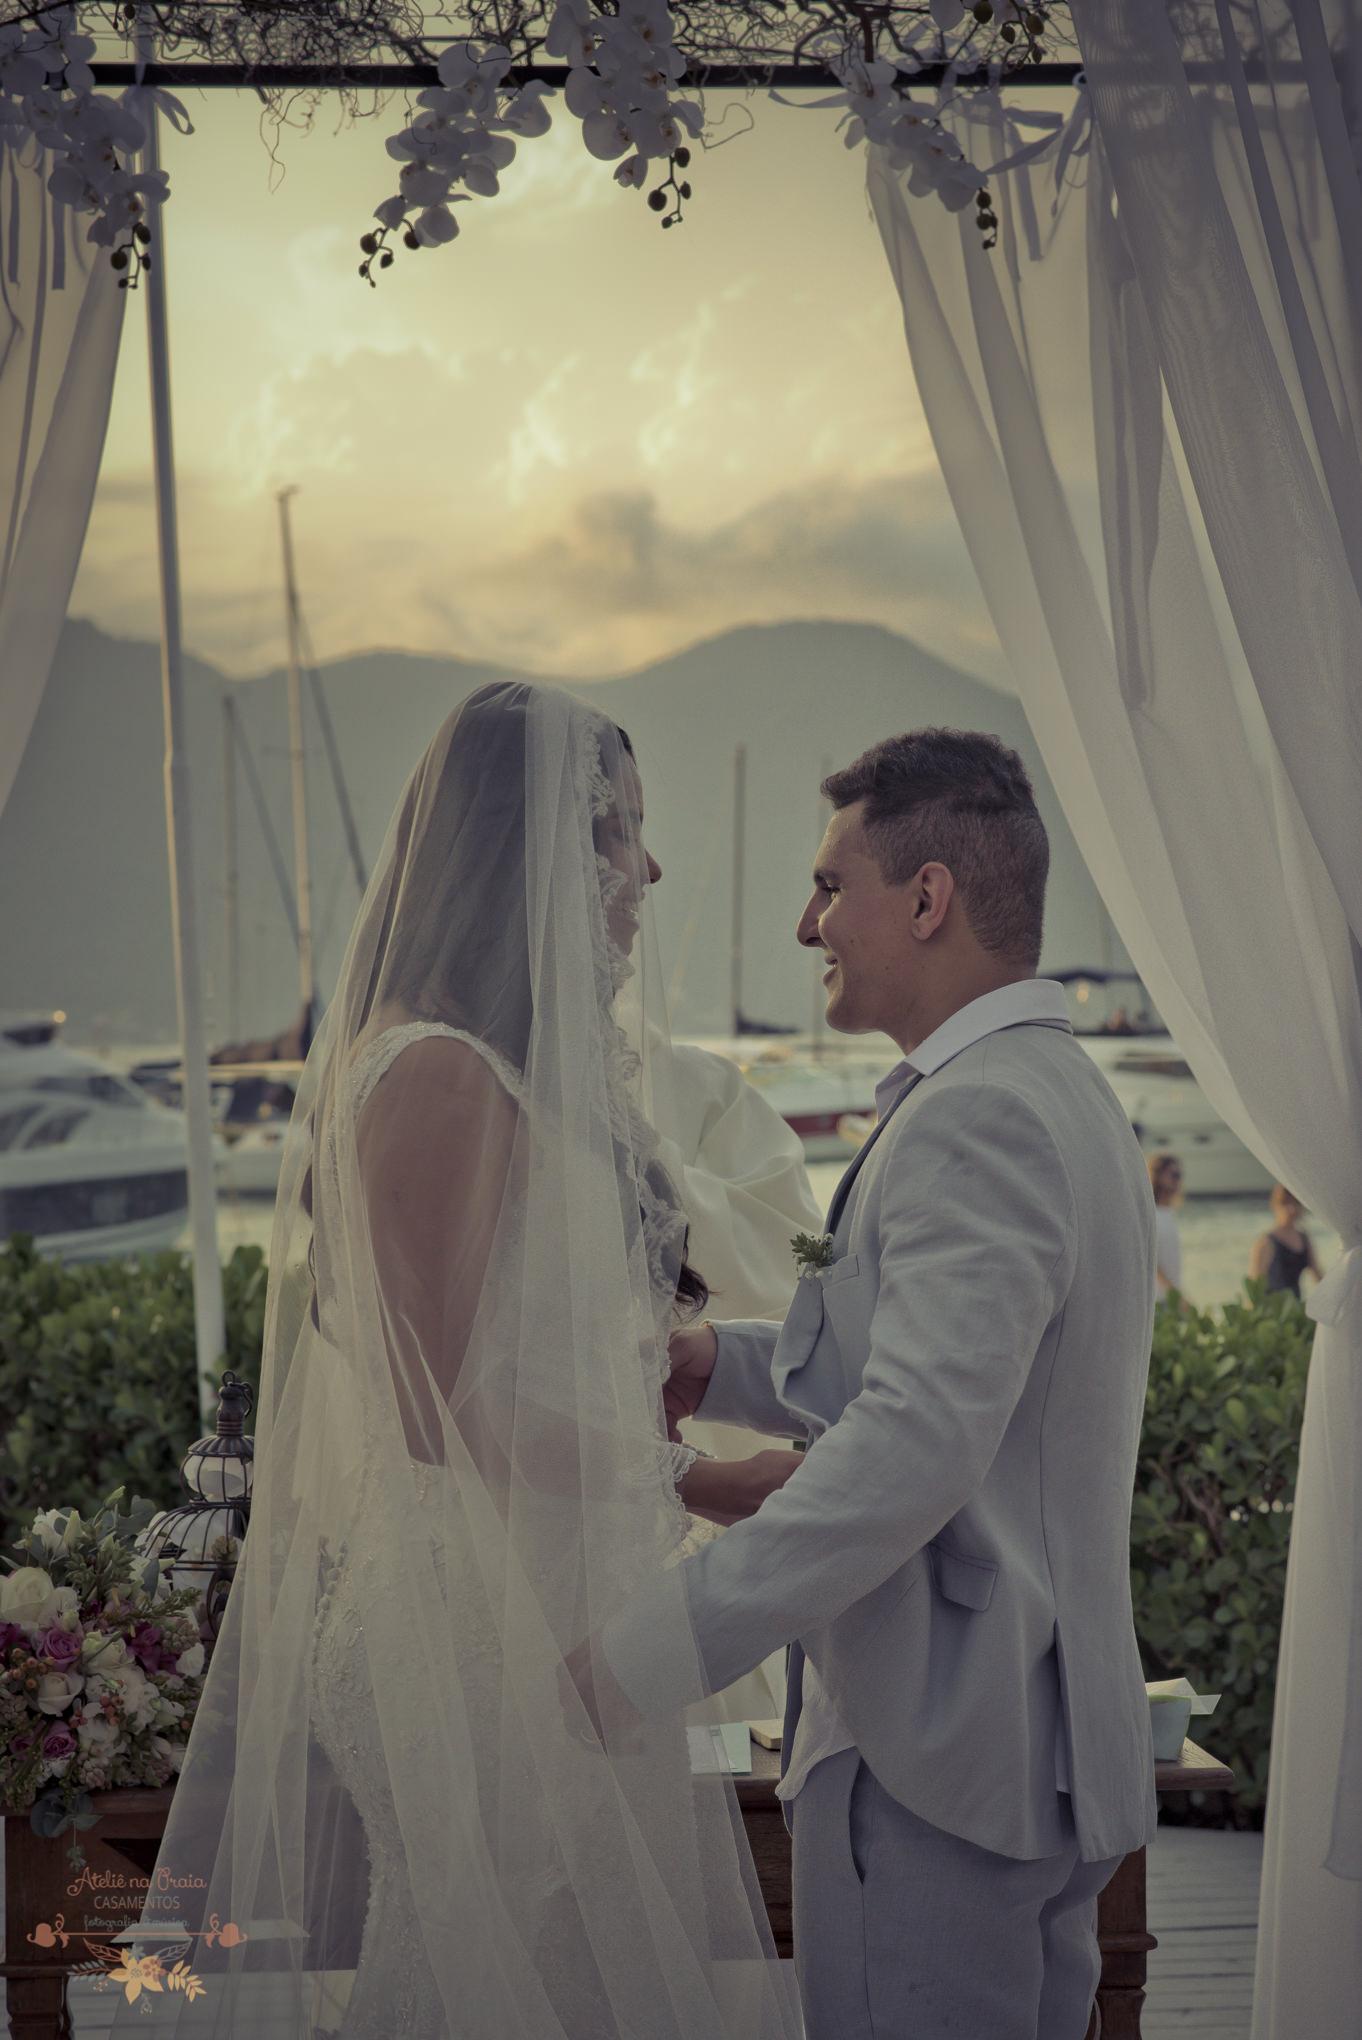 04-Cerimonia-Atelie-na-Praia-Casamento-na-Praia-Natalia-Felipe-PQ-9350A